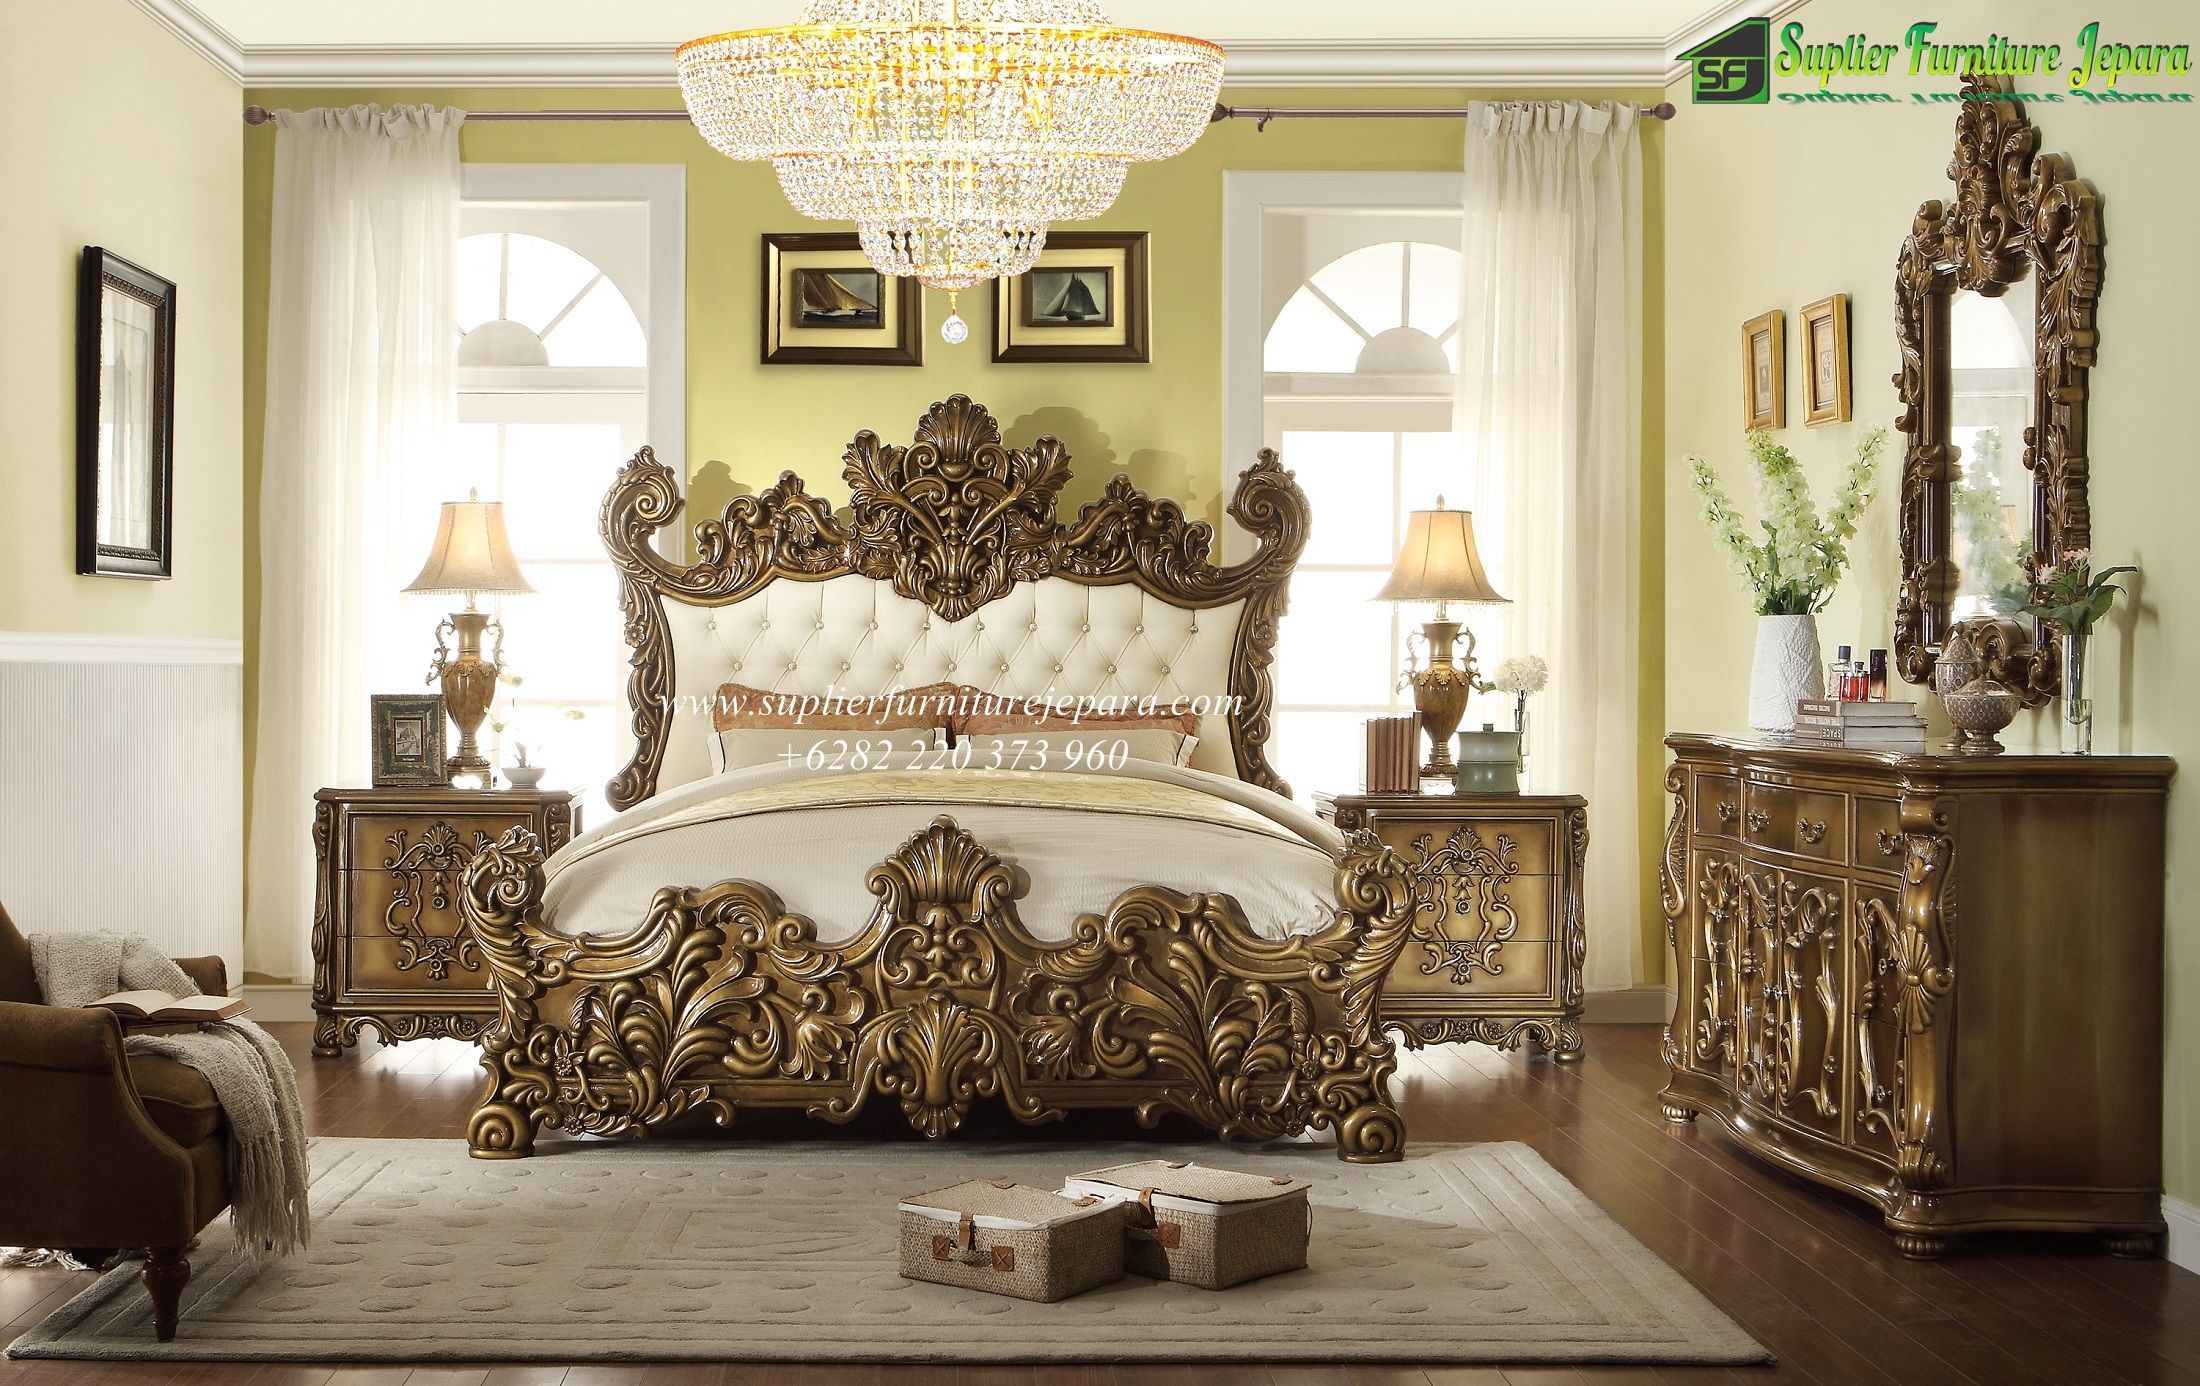 royal bedroom sets - HD2200×1386